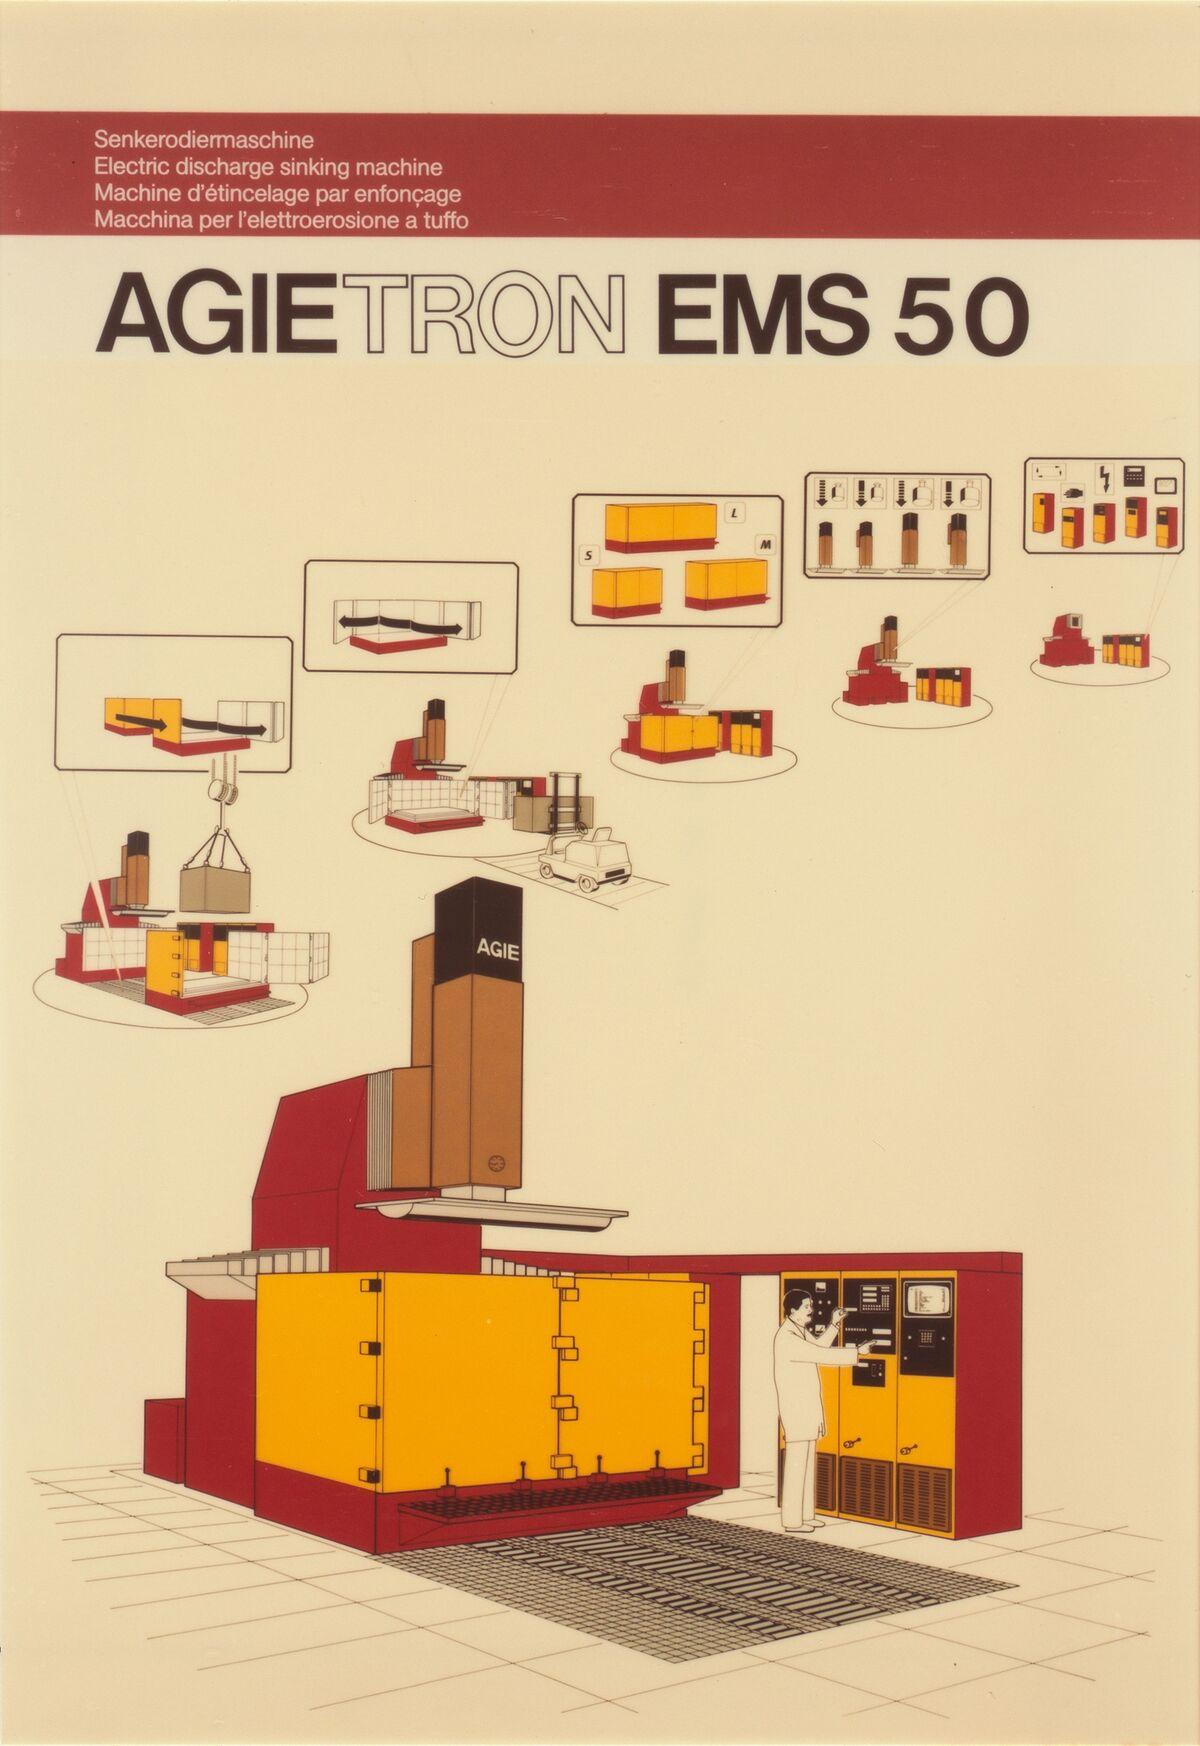 GFA 42/100086: AGIETRON EMS 50